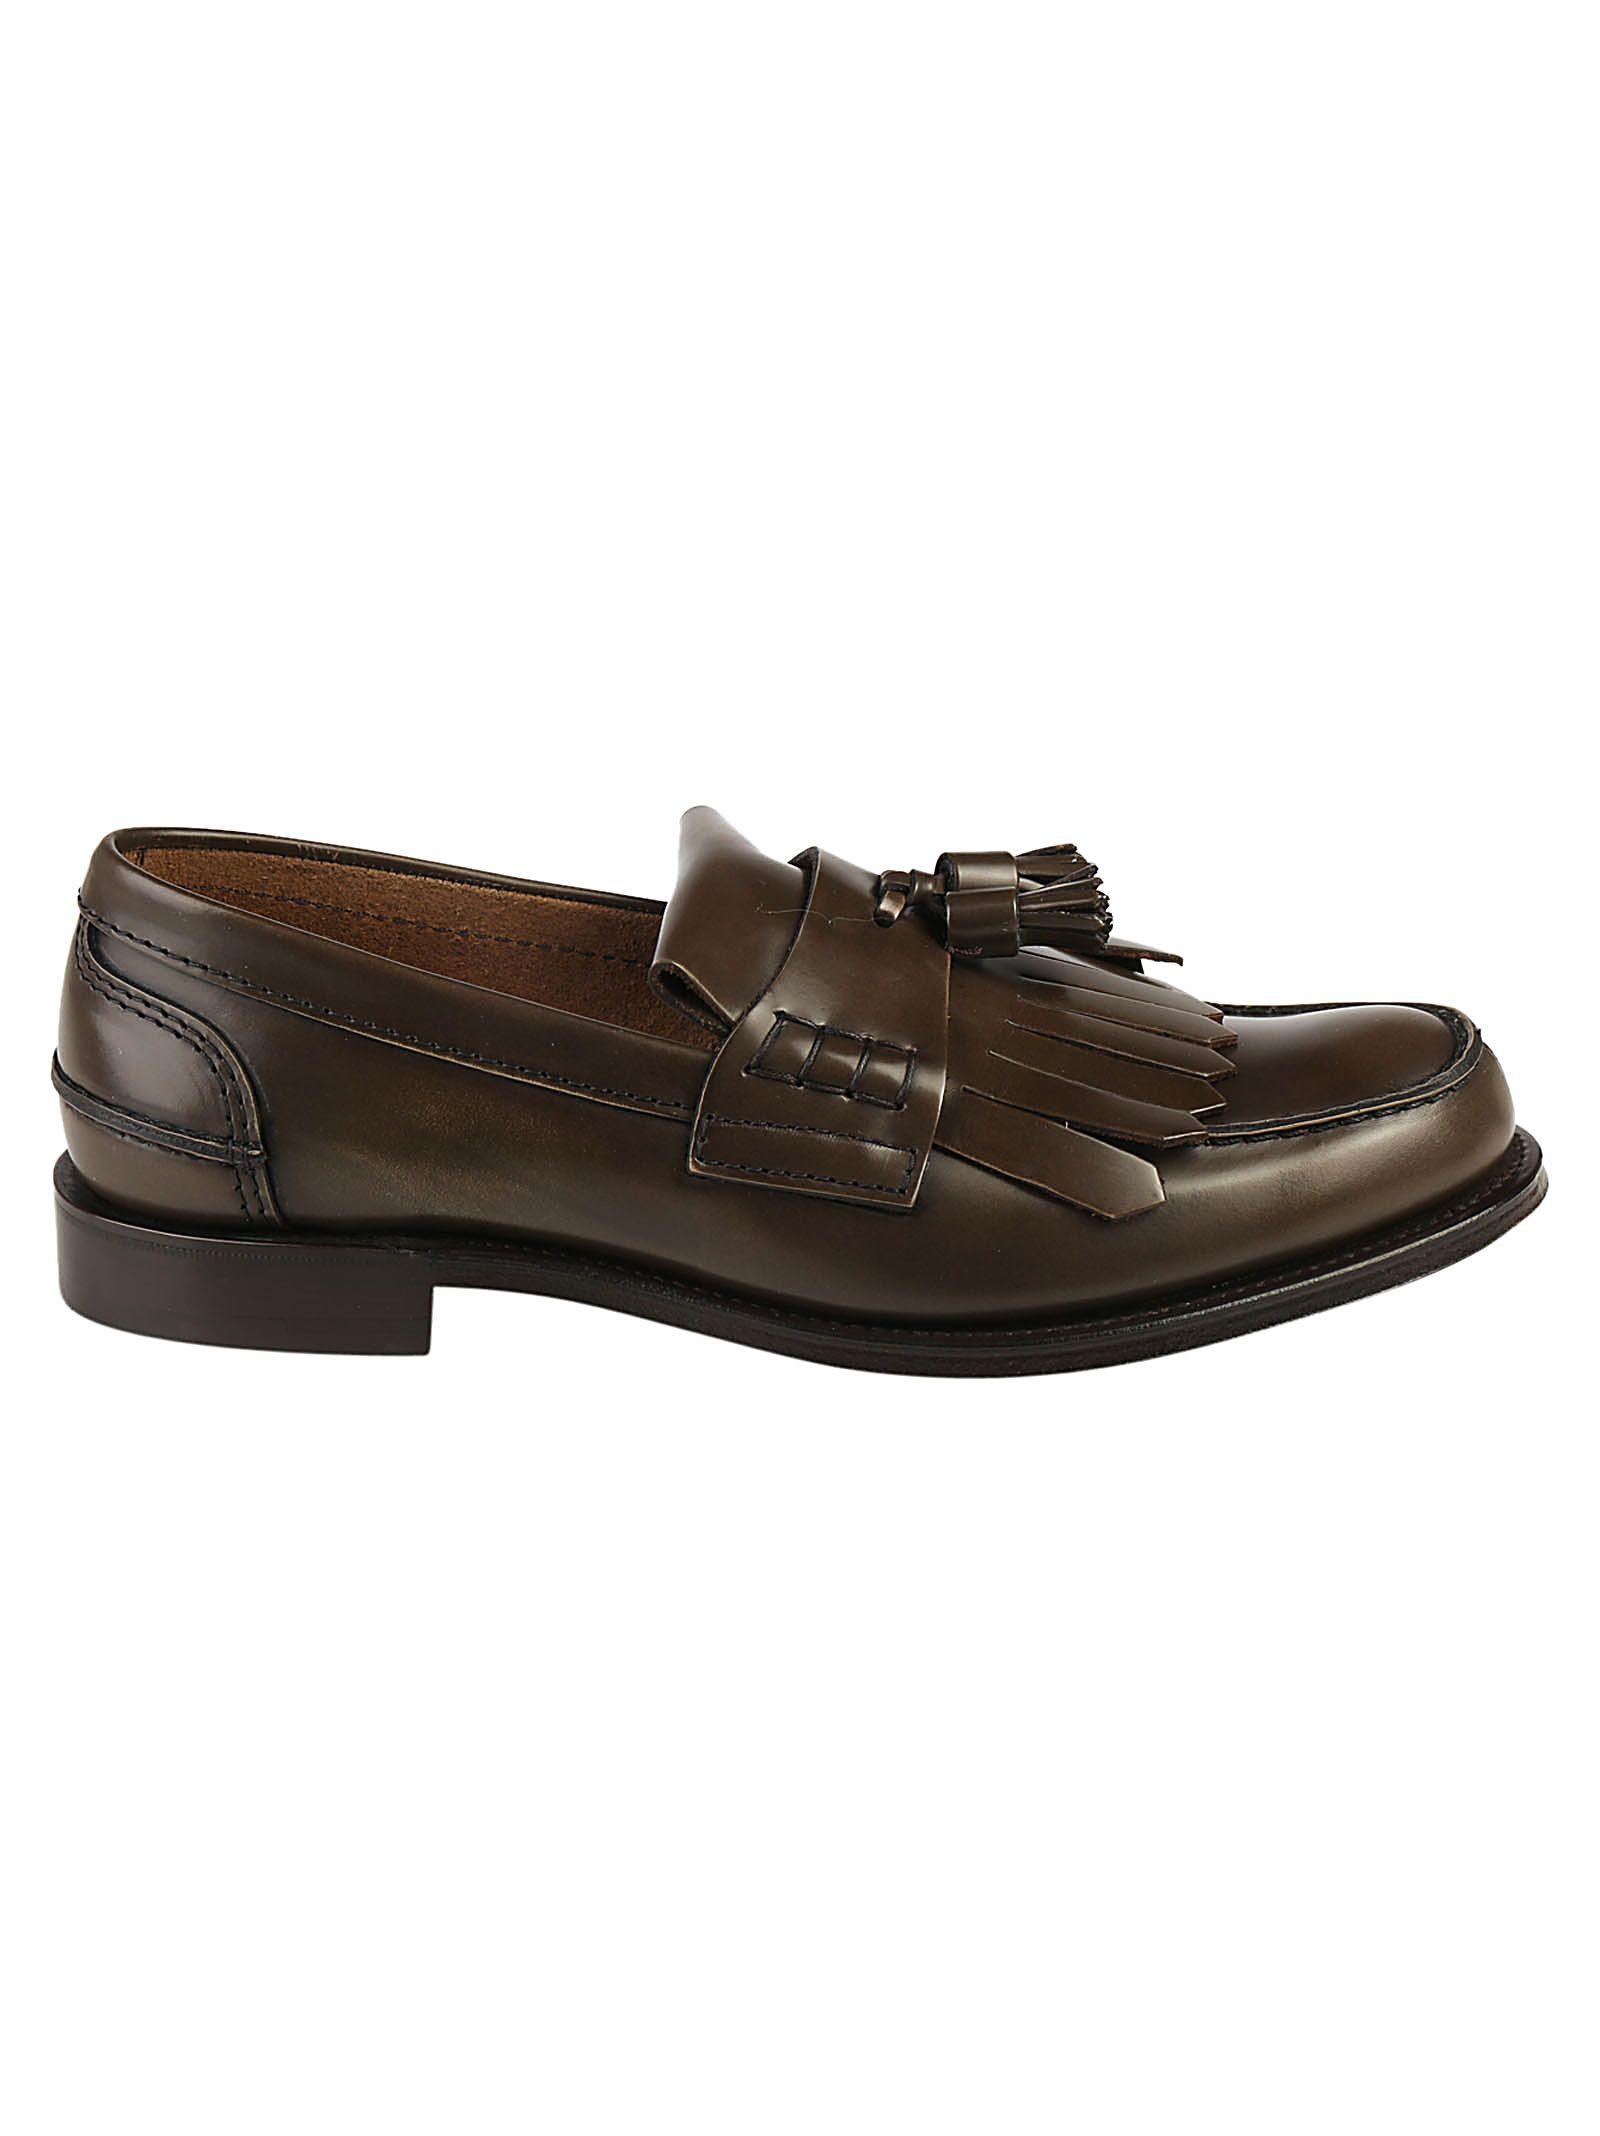 Churchs Oreham Loafers